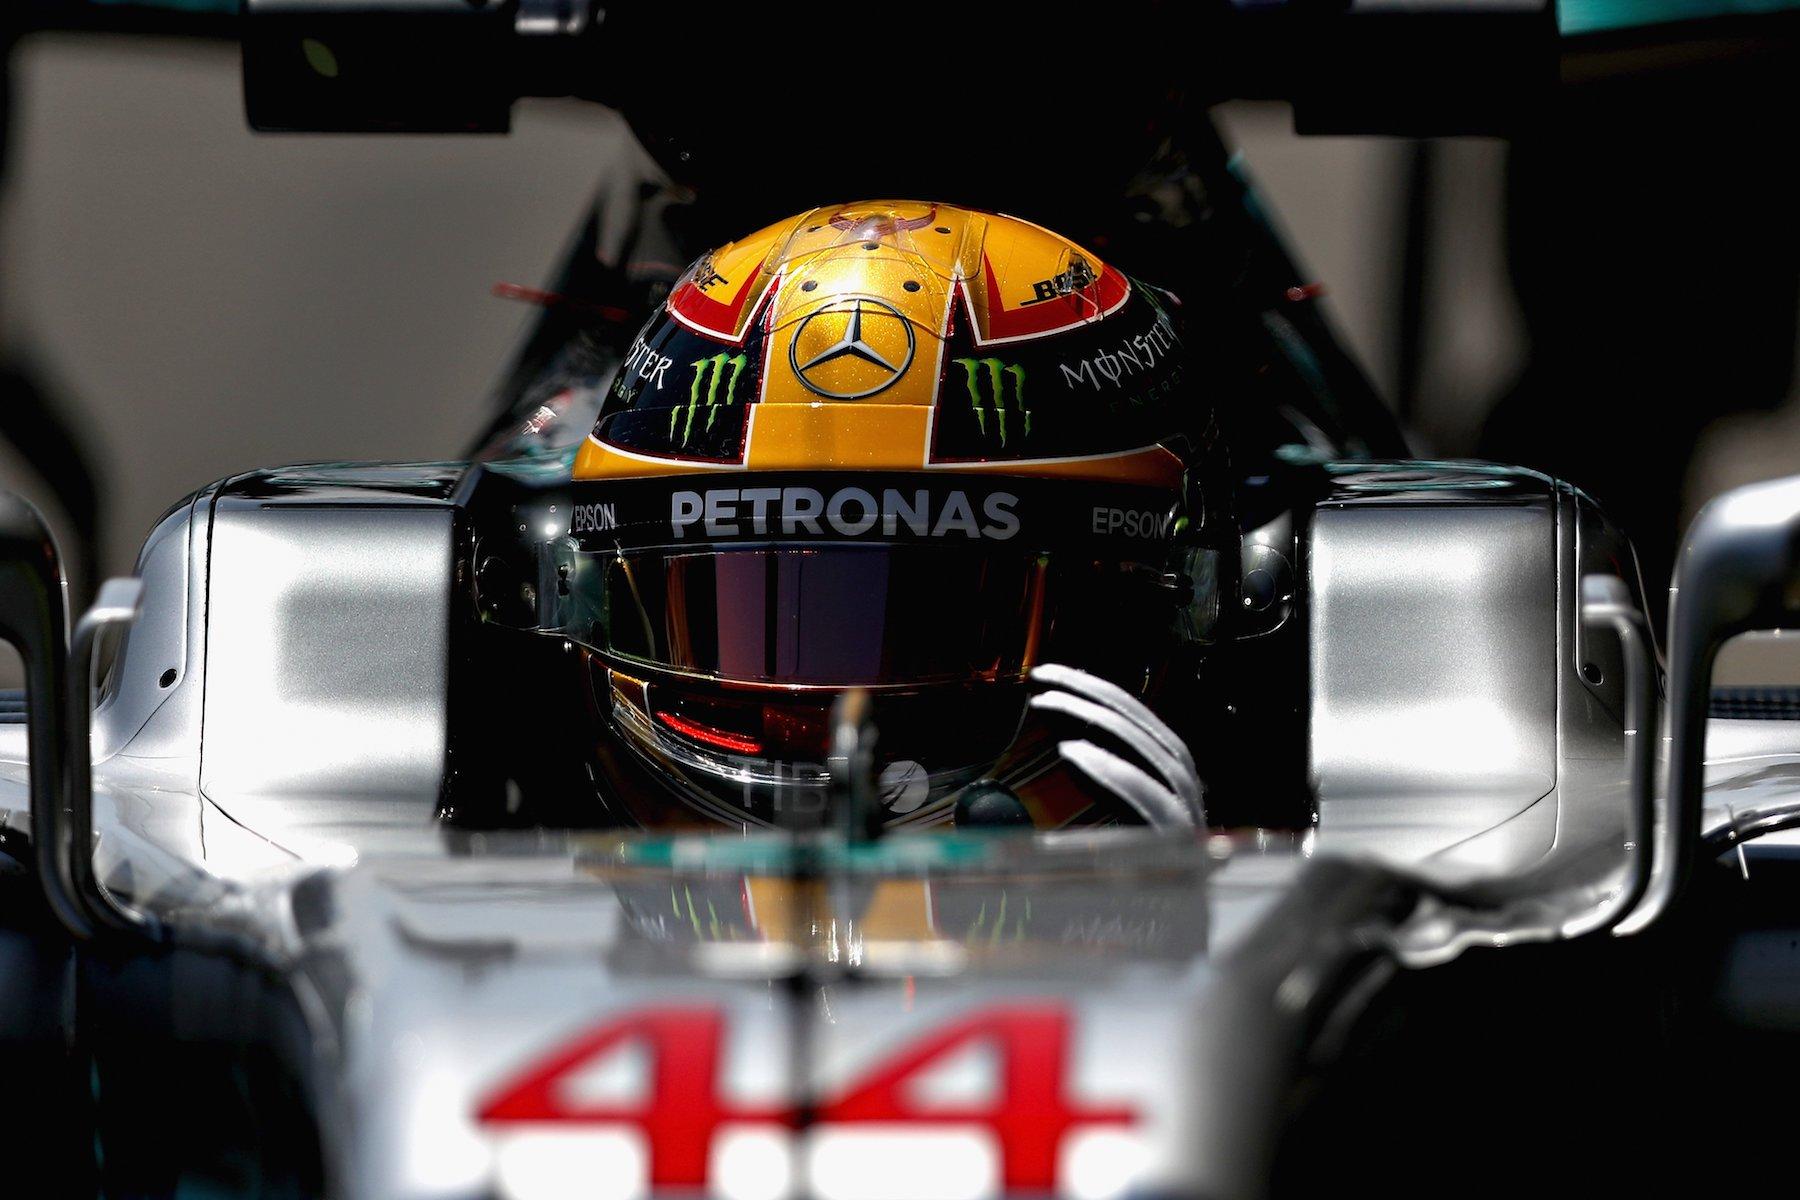 2017 Lewis Hamilton | Mercedes W08 | 2017 Azerbaijan GP FP1 1 copy.jpg